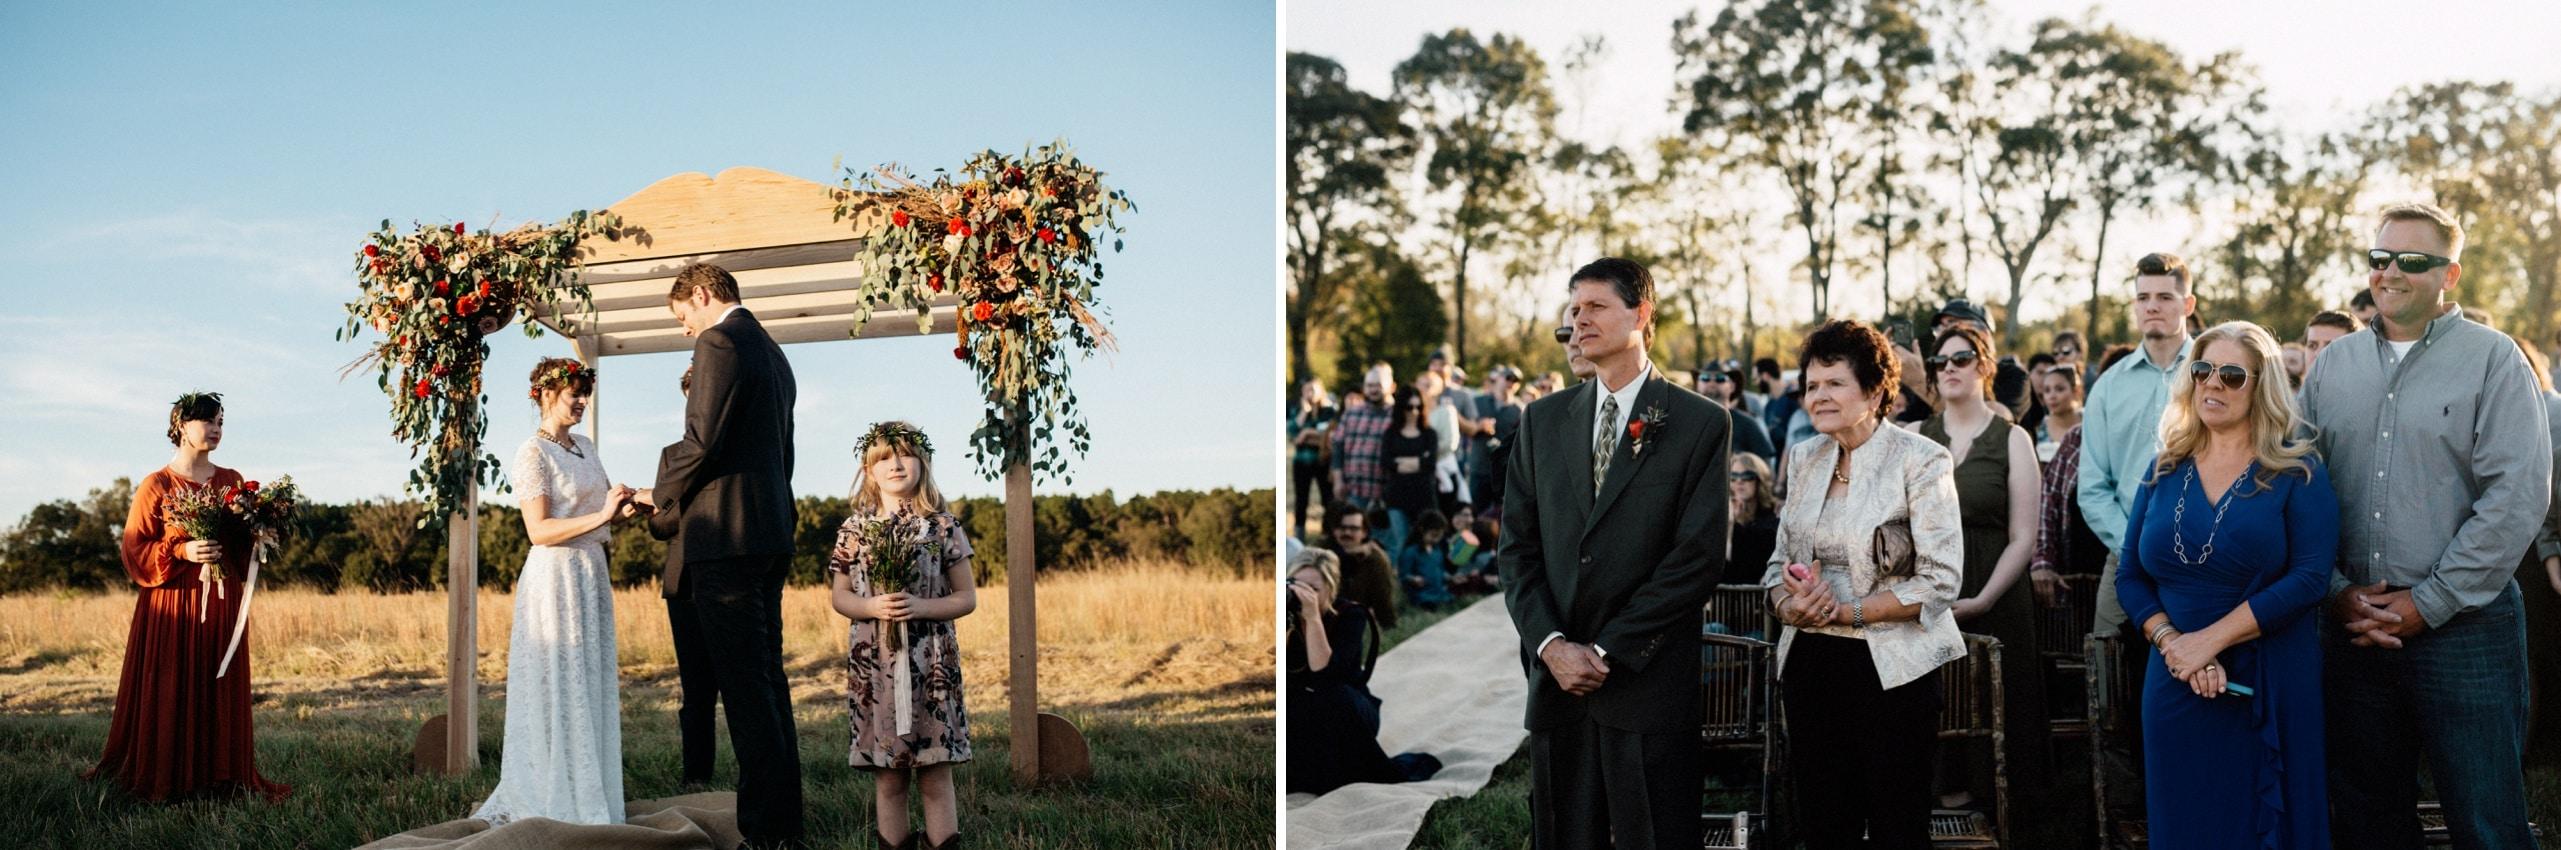 Southern_Surprise_Wedding_0094